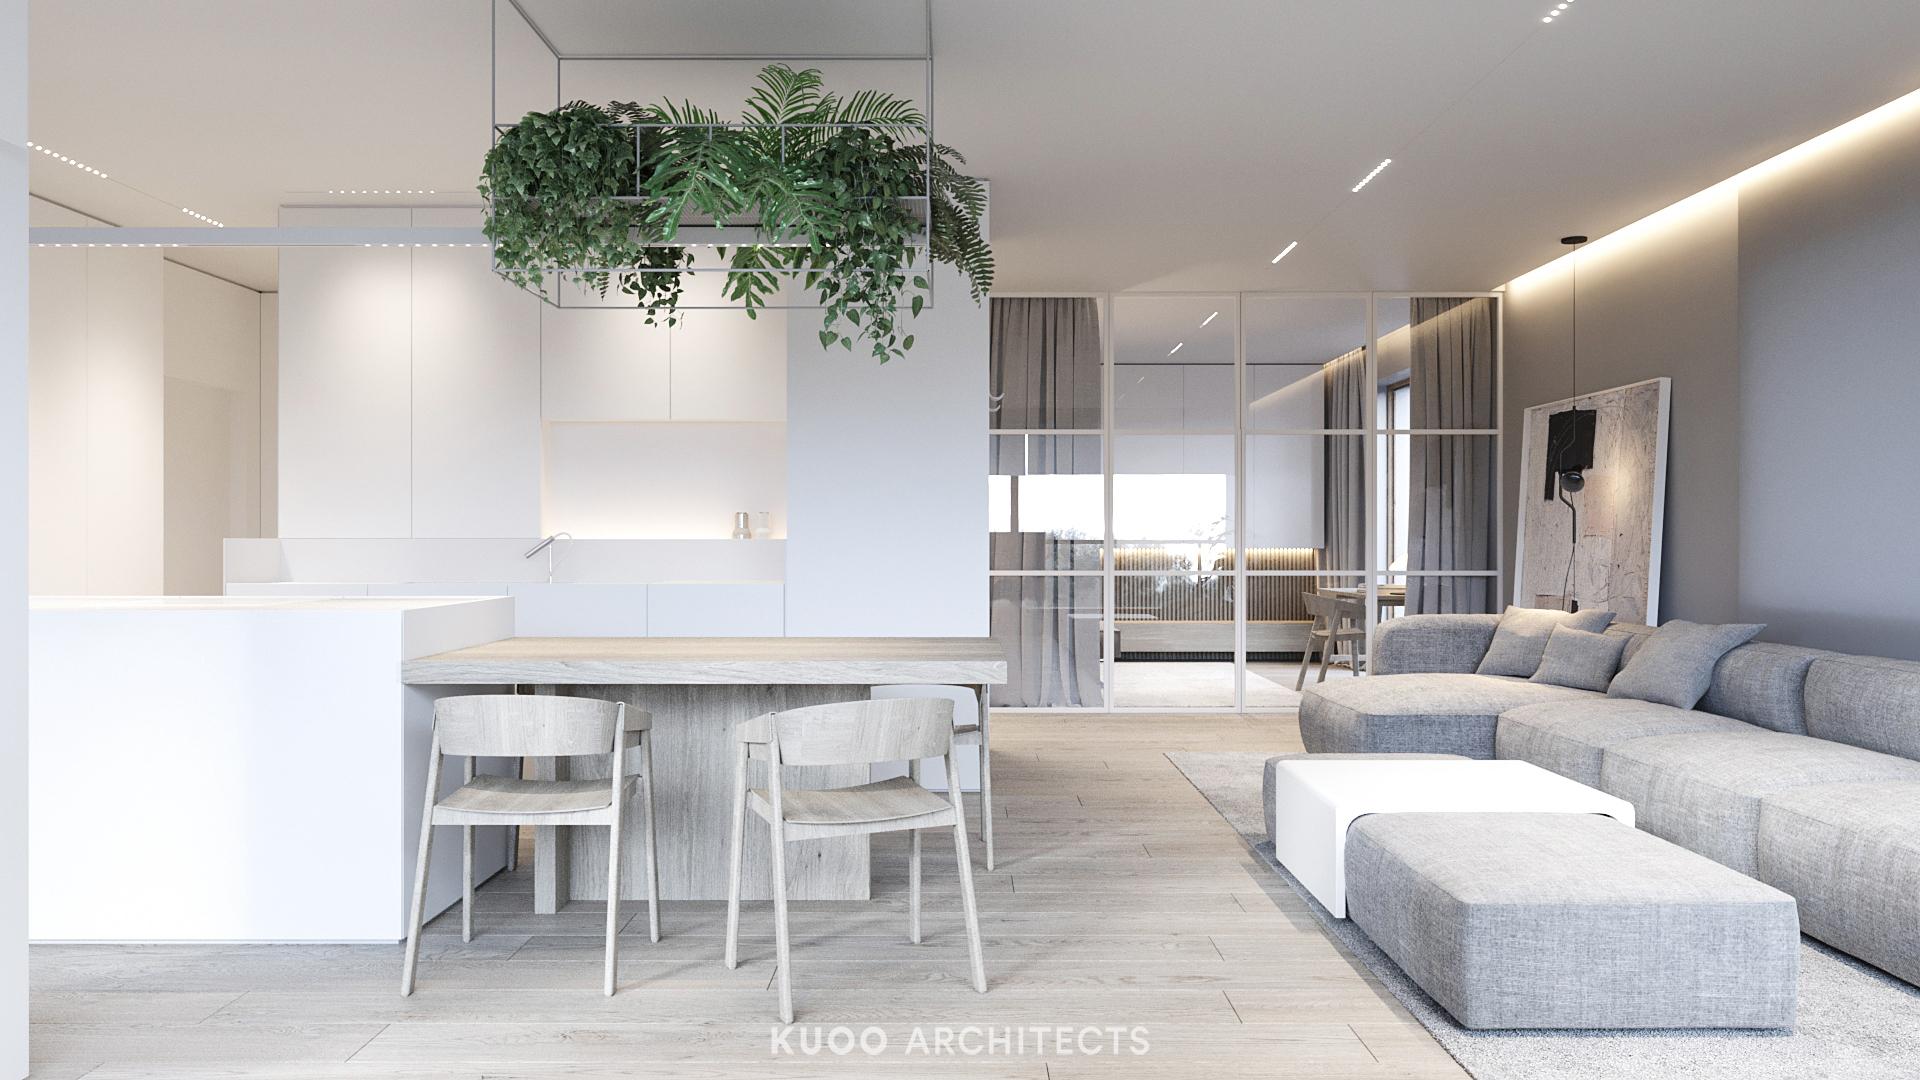 kuoo_architects_ap_warsaw_8_07